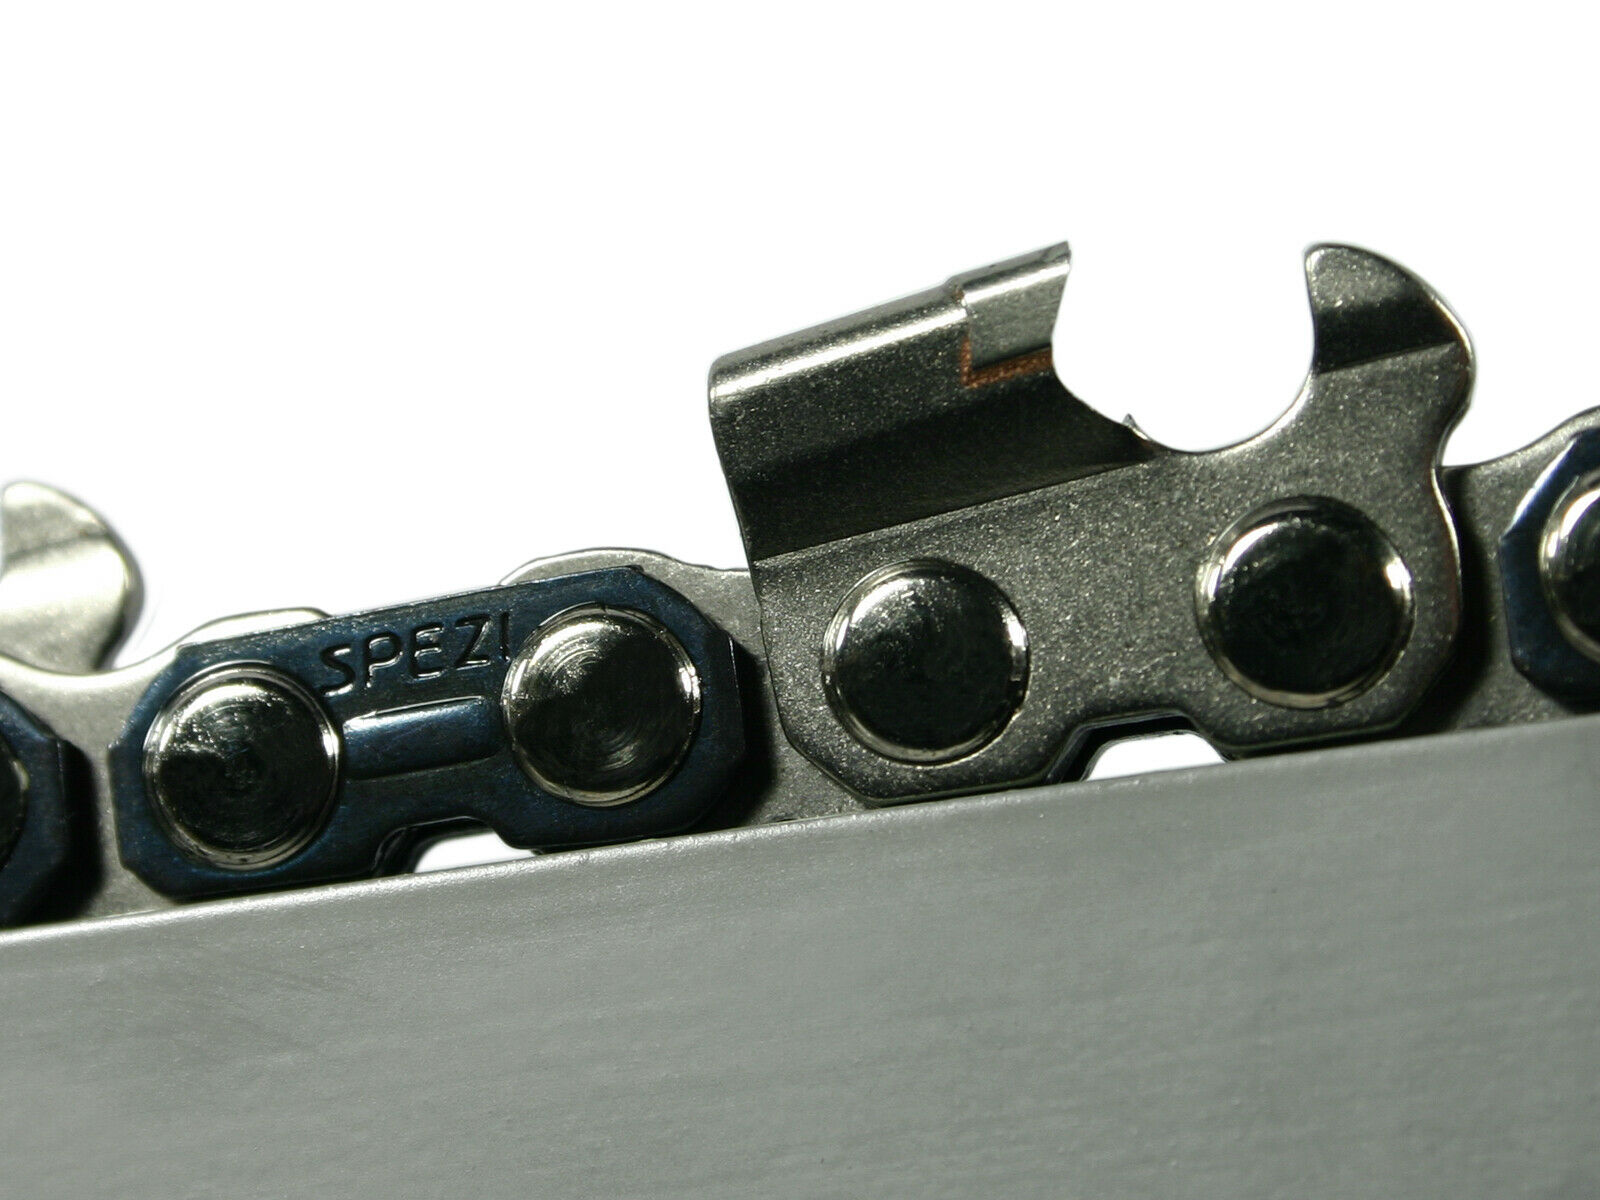 Metal duro cadena sierra adecuado para Husqvarna 45 43 cm 3 8  64 TG 1,5 mm Cochebide